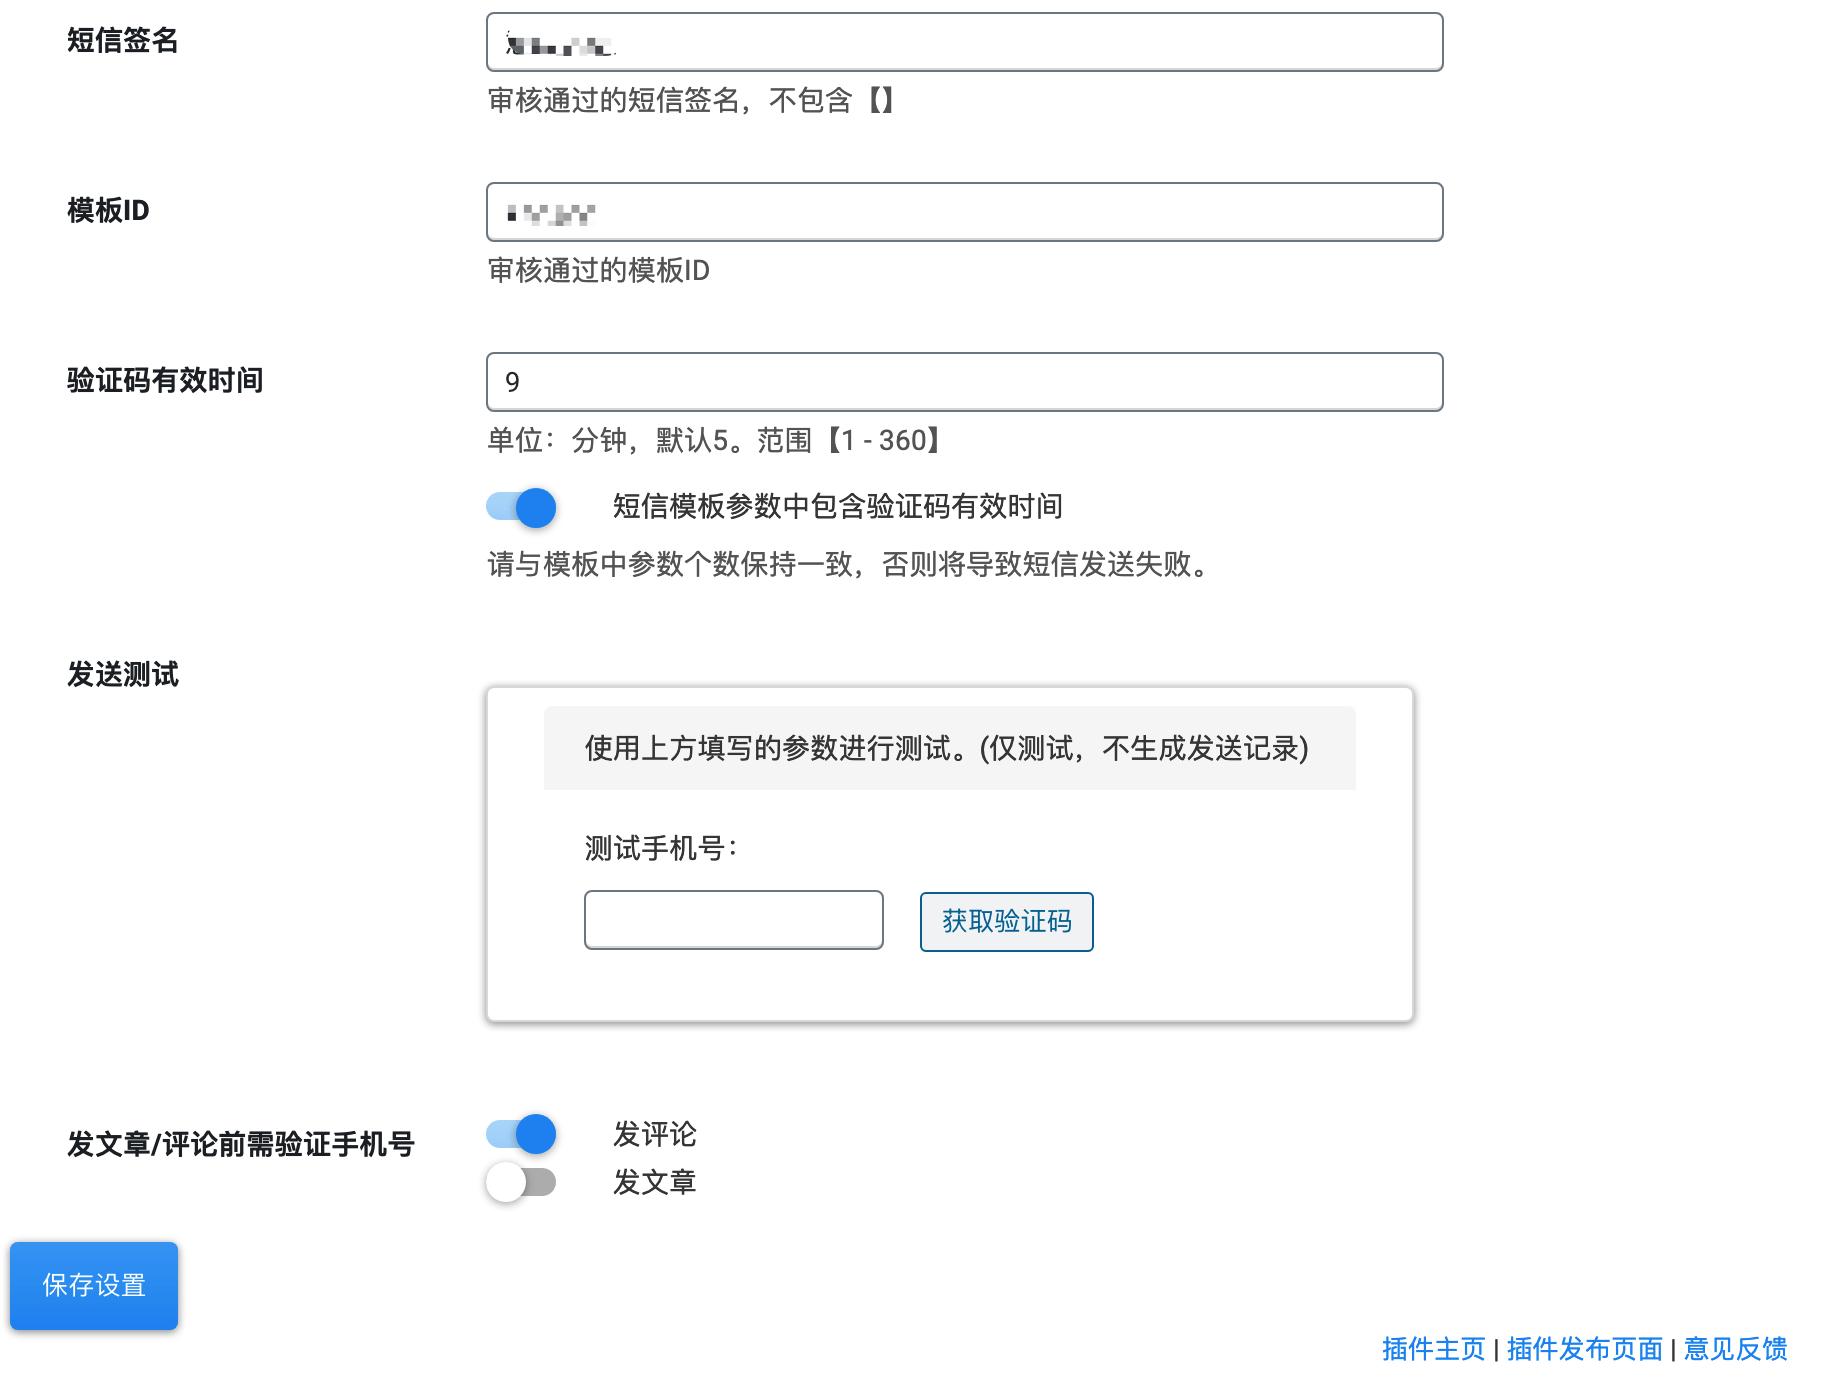 WordPress手机验证码登录插件:腾讯云短信插件「腾讯开发」